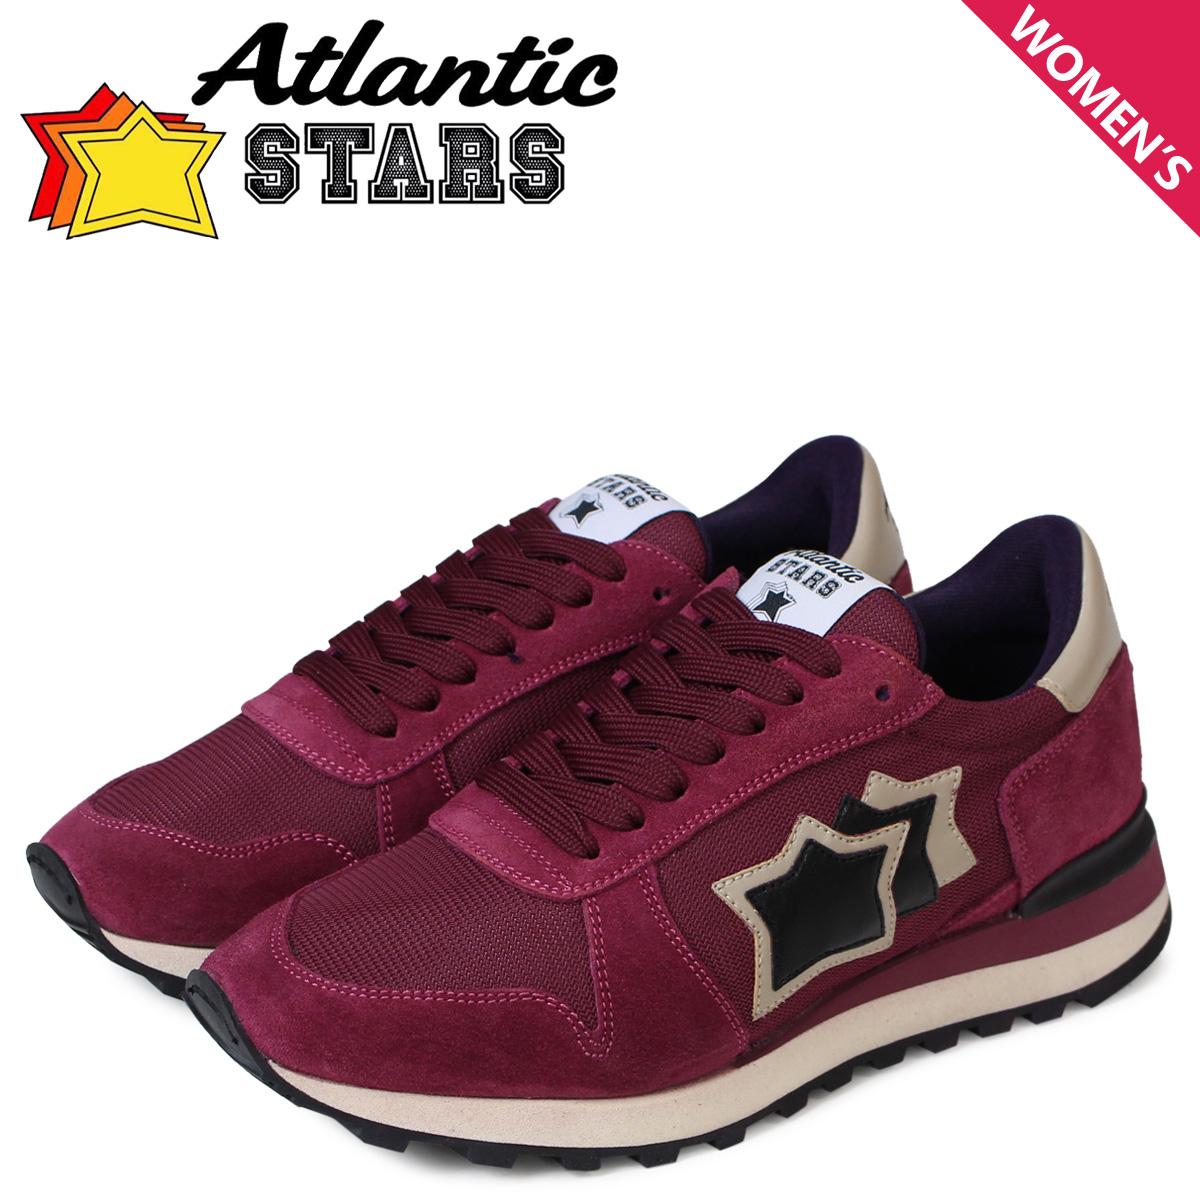 Atlantic STARS レディース スニーカー アトランティックスターズ アレナ ALHENA FLNYNPVN ワインレッド 赤